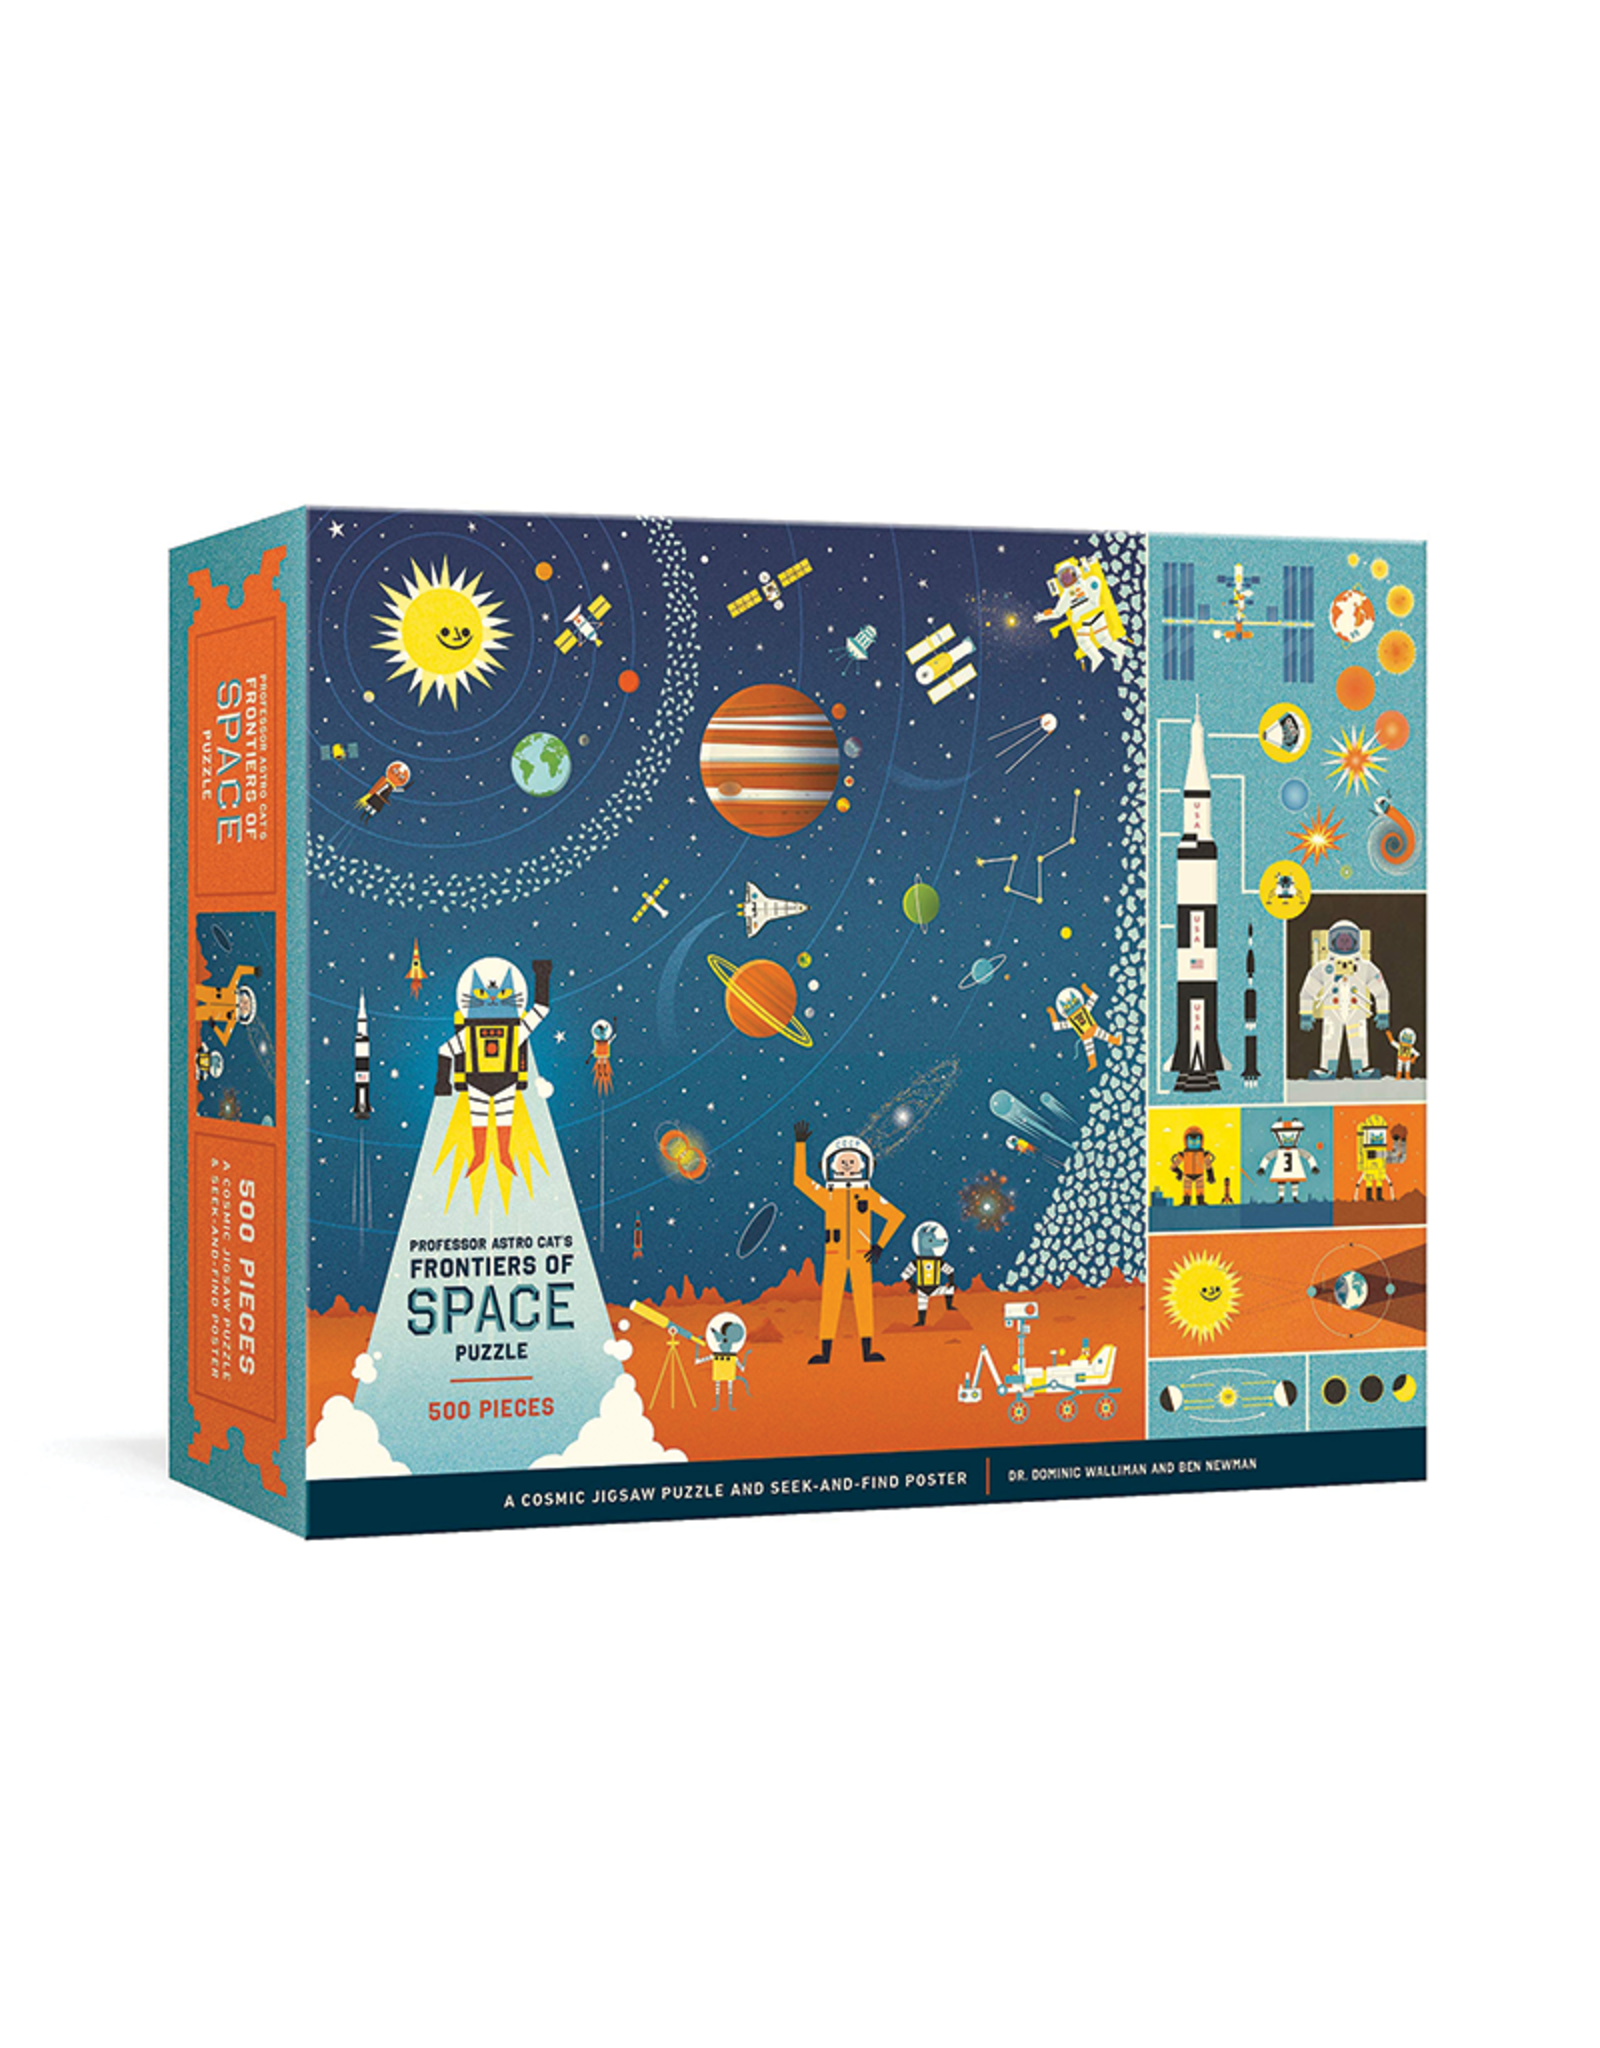 Professor Astro Cat's Frontiers of Space Puzzle